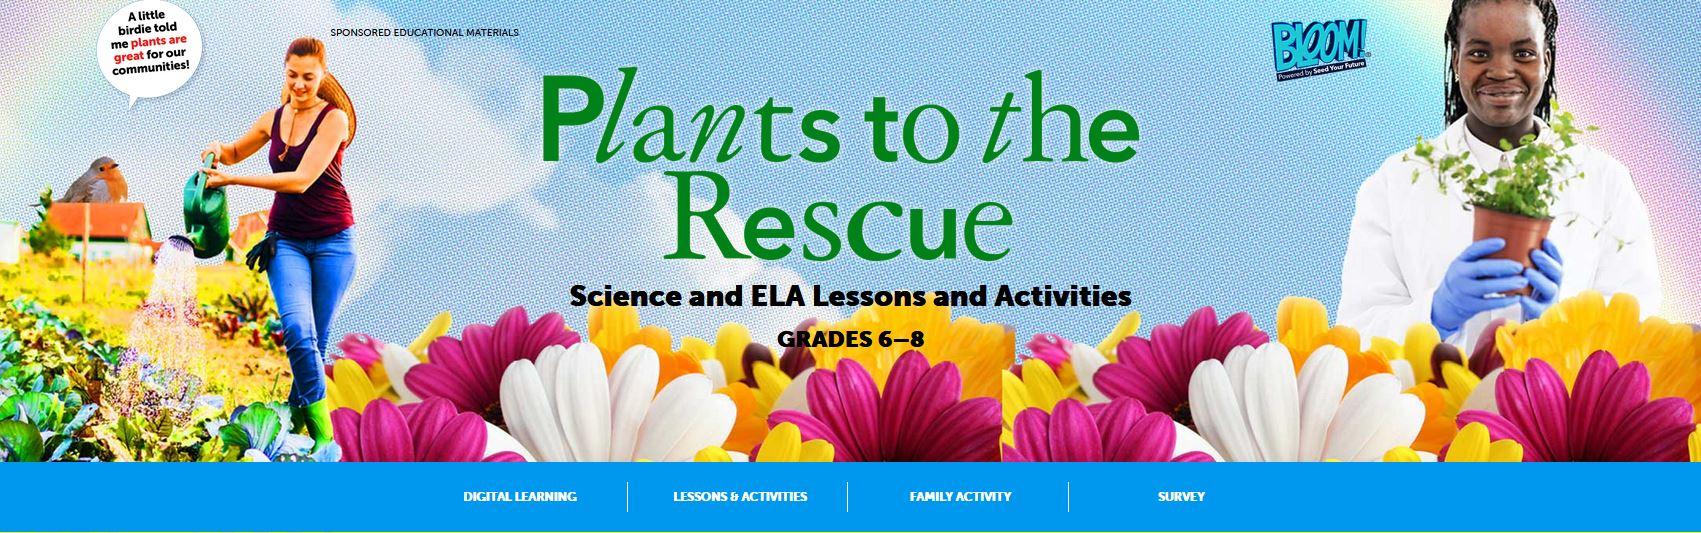 BLOOM_Scholastic_Site_Image.JPG